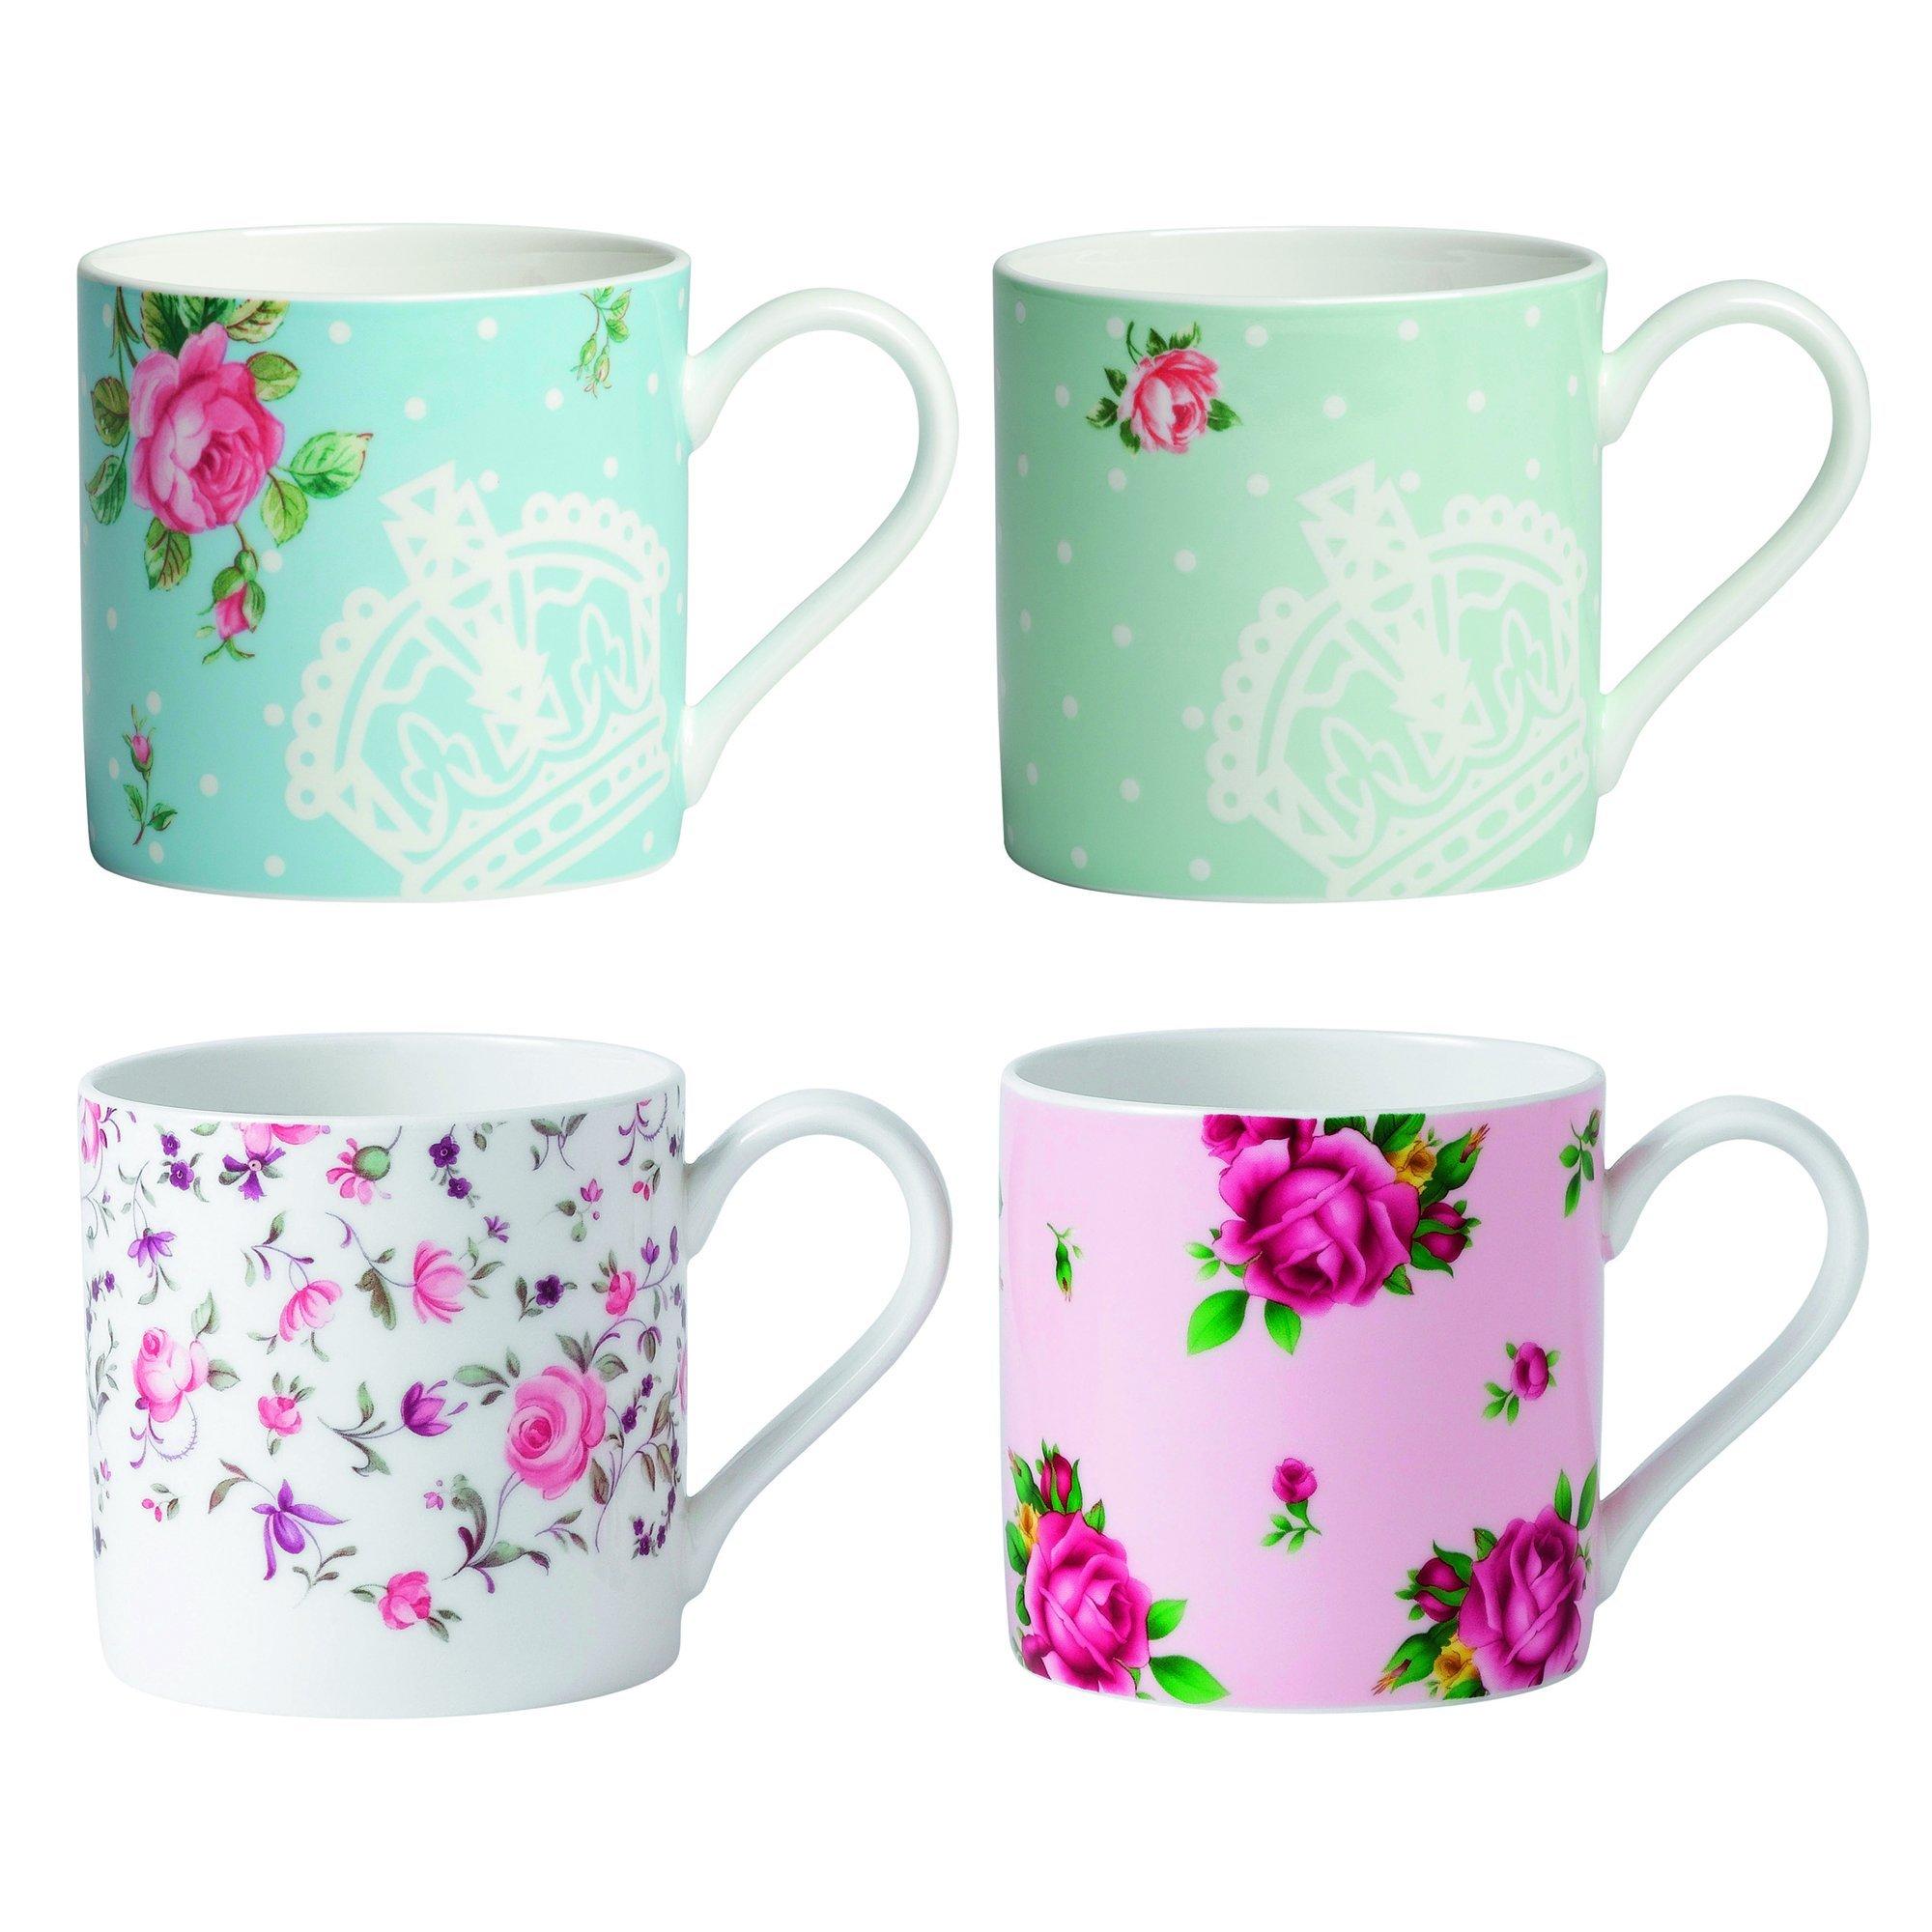 Royal Albert New Country Roses Modern Mugs, White, Set of 4 by Royal Albert